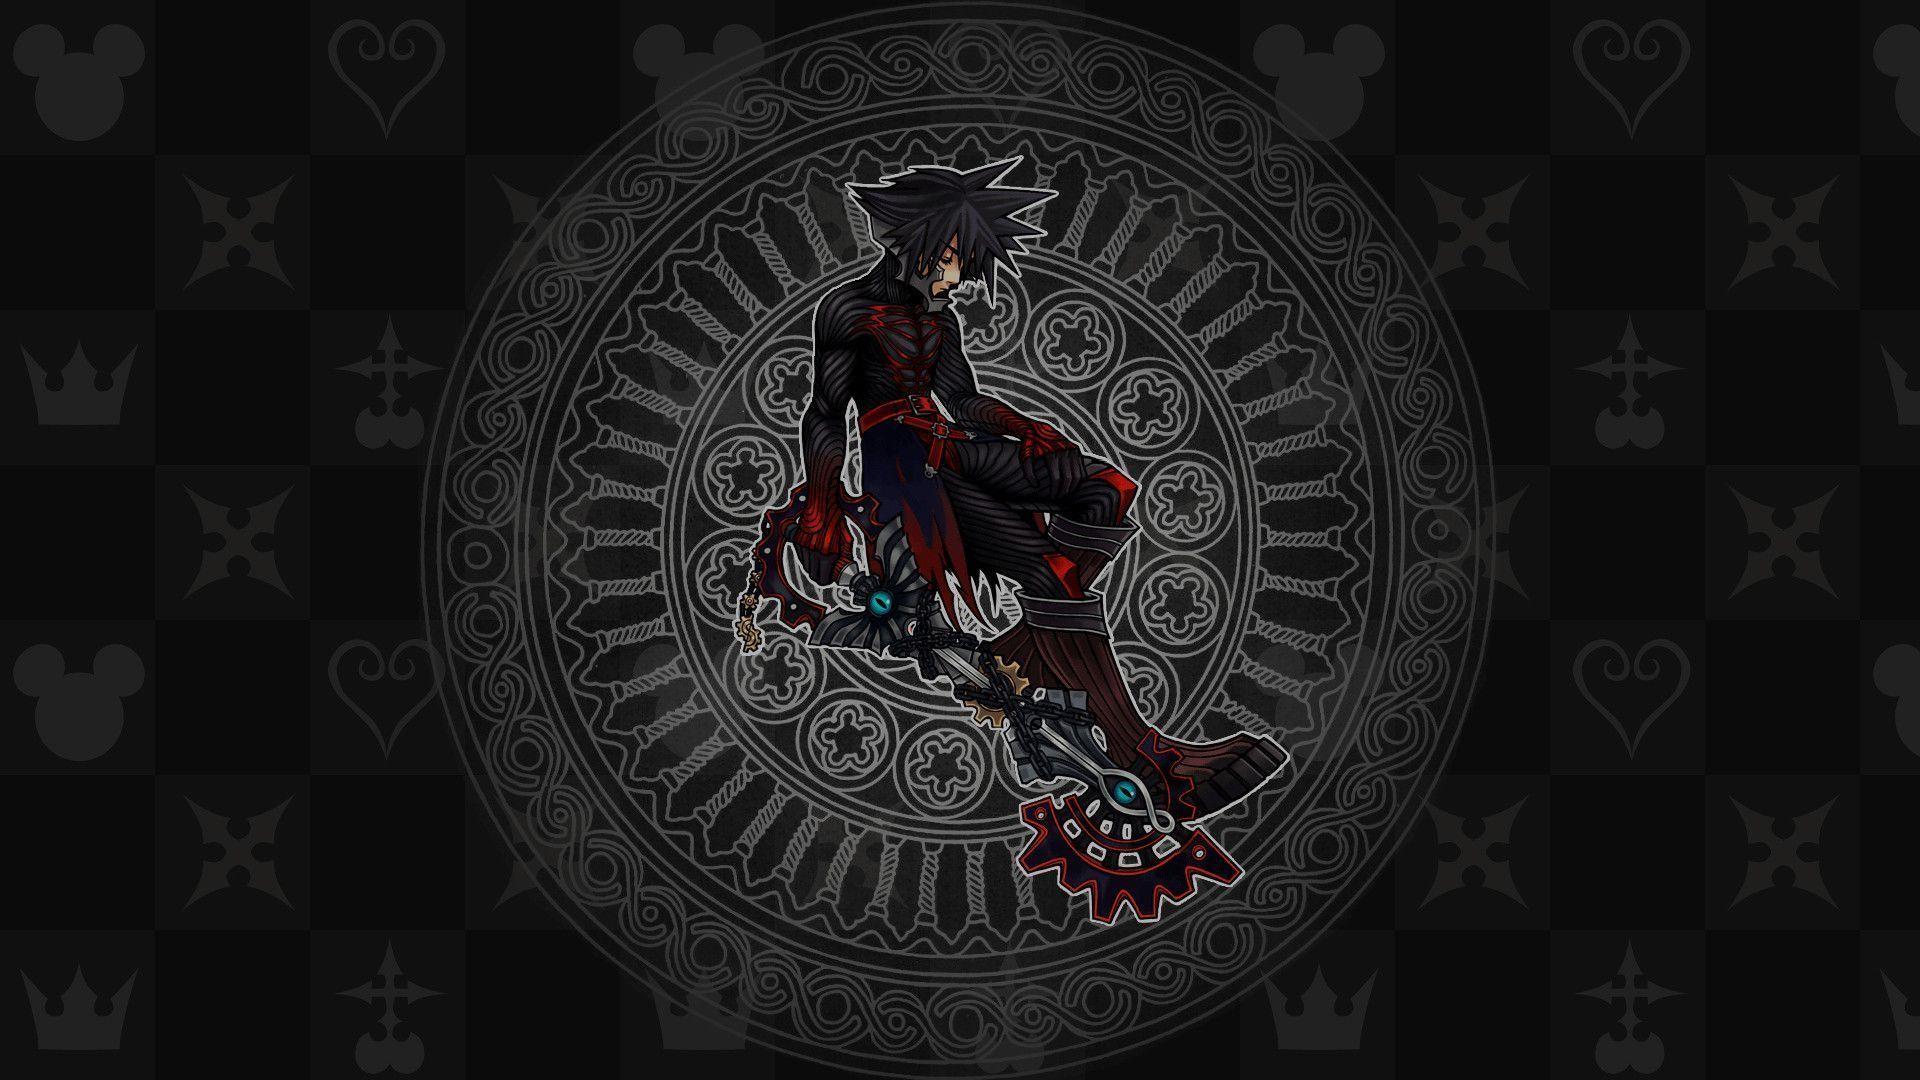 Kingdom Hearts Heartless Wallpapers – Wallpaper CaveKingdom Hearts  Heartless Wallpaper